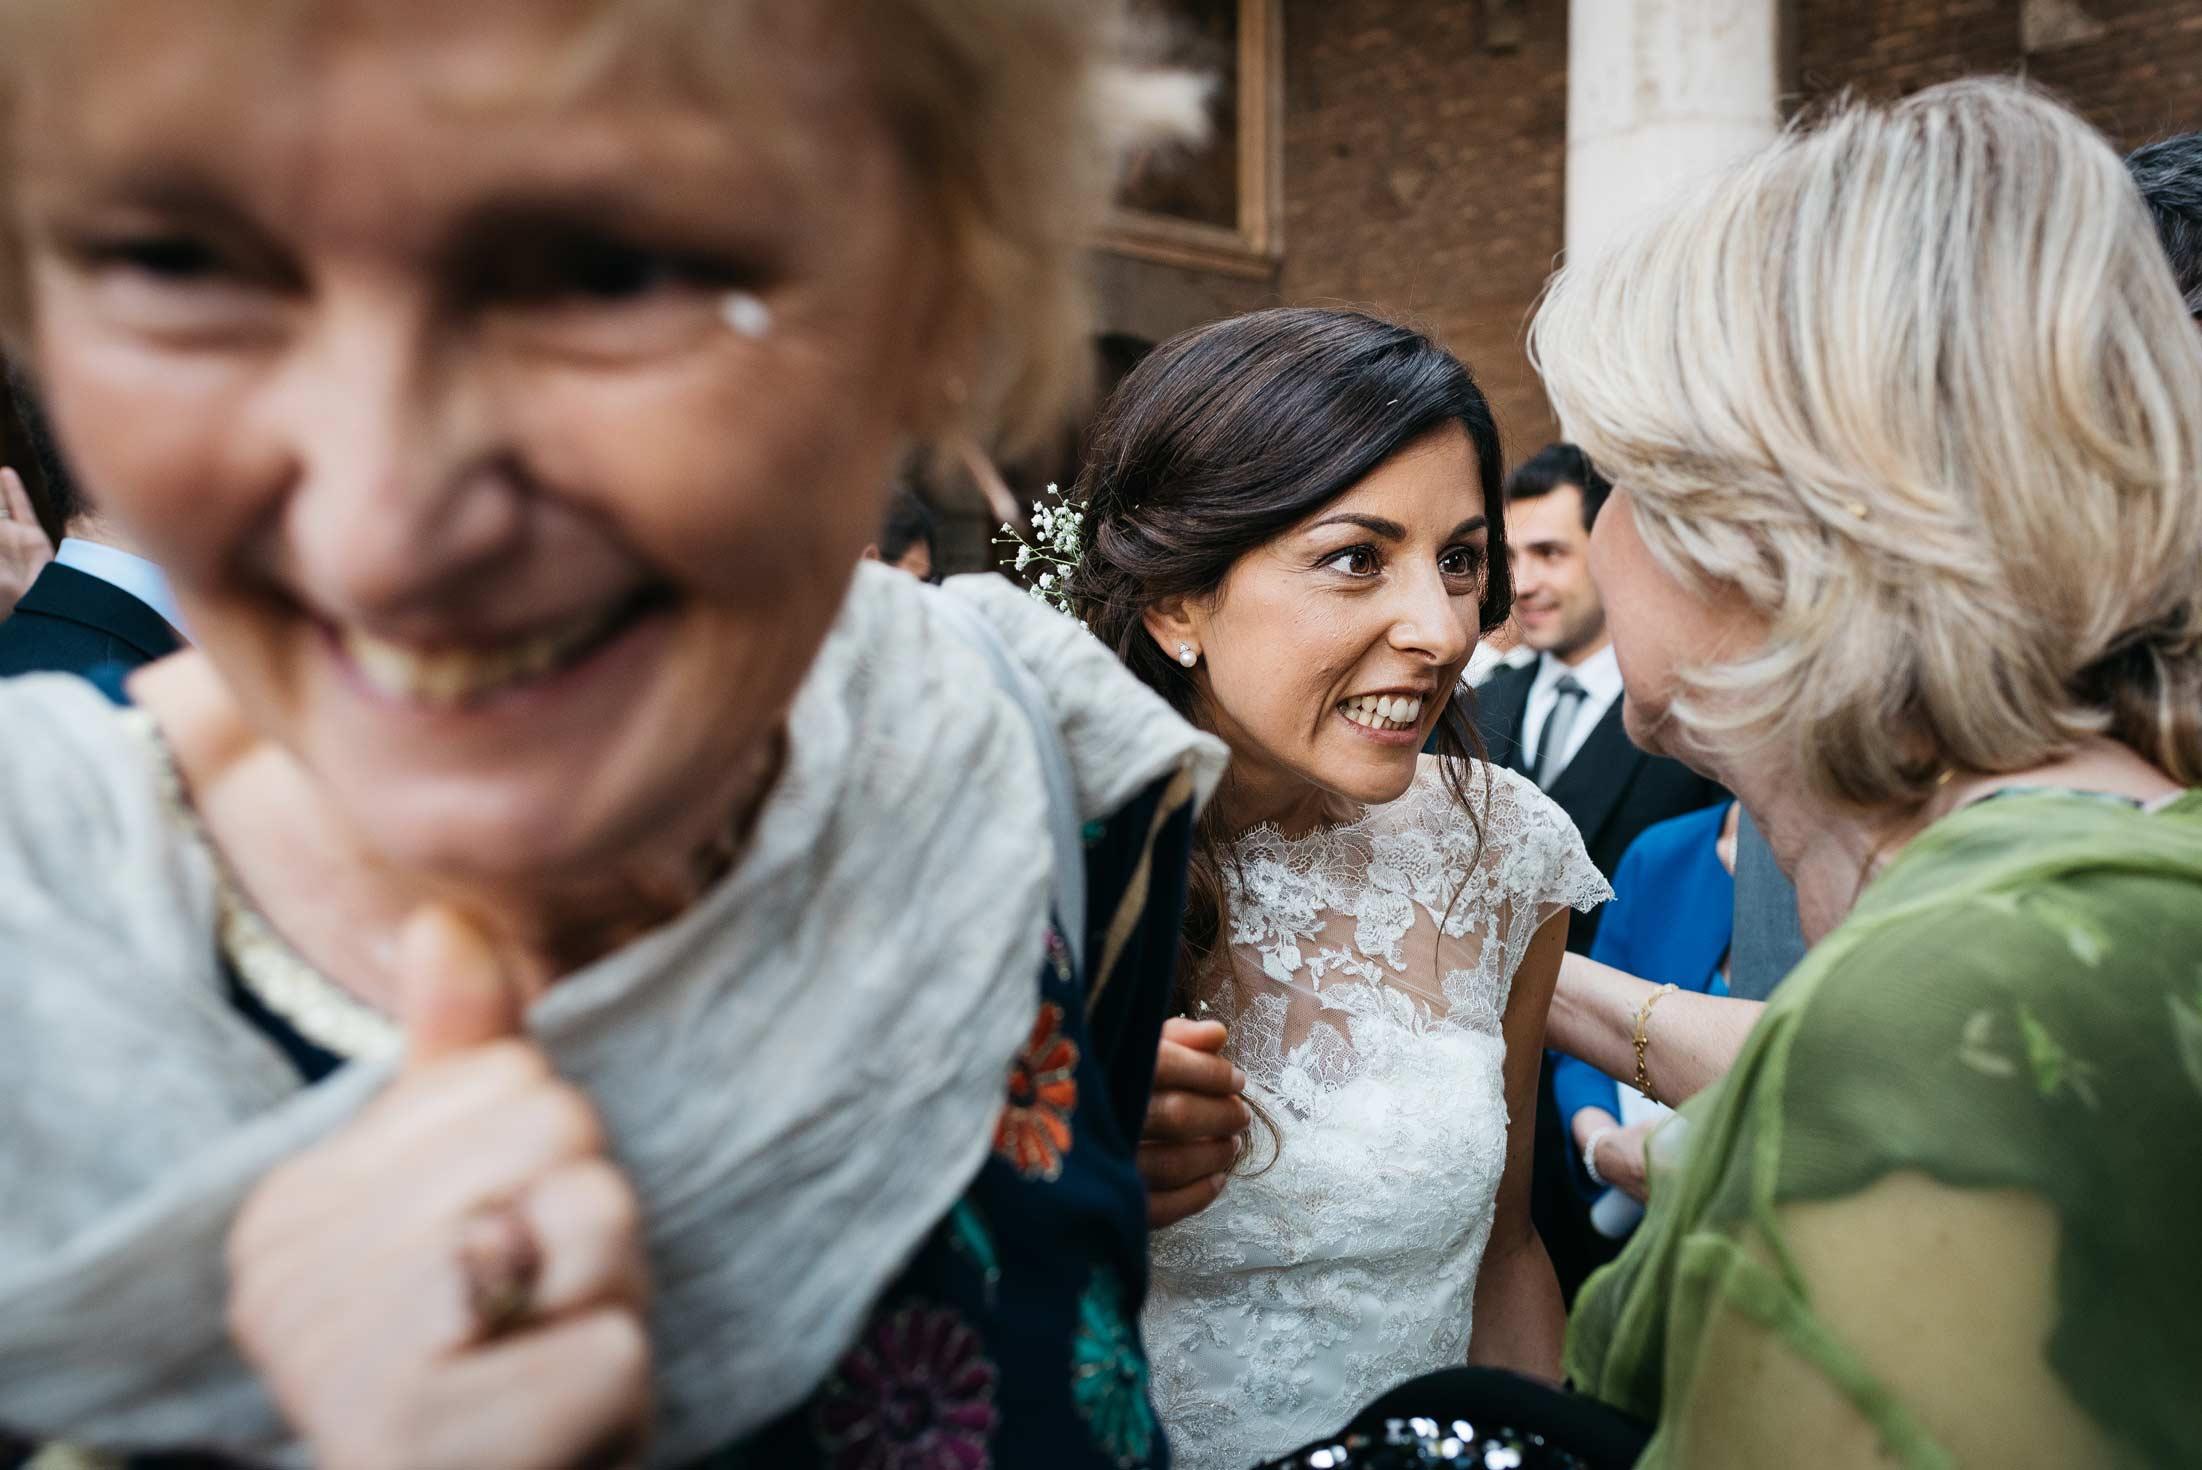 Fotografo-Matrimoni-Stile-Reportage-Cerimonia